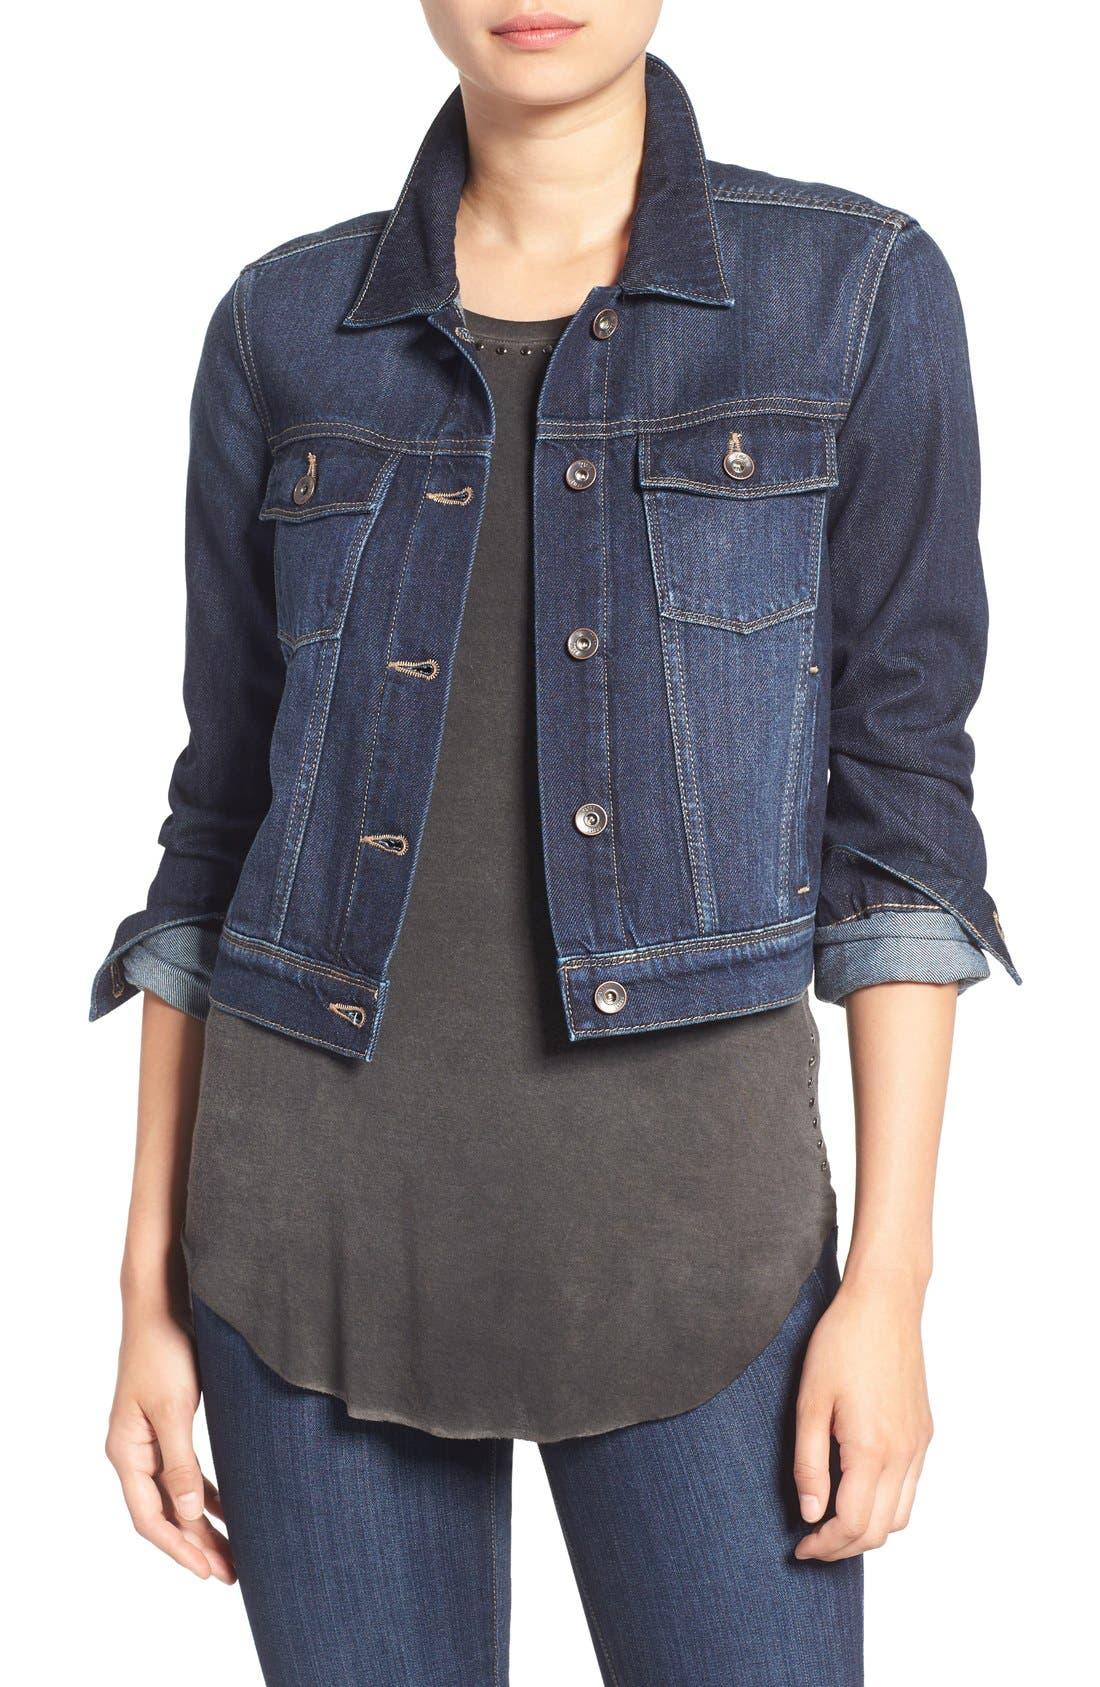 Alternate Image 1 Selected - PAIGE 'Vivienne' Denim Jacket (Arwen)